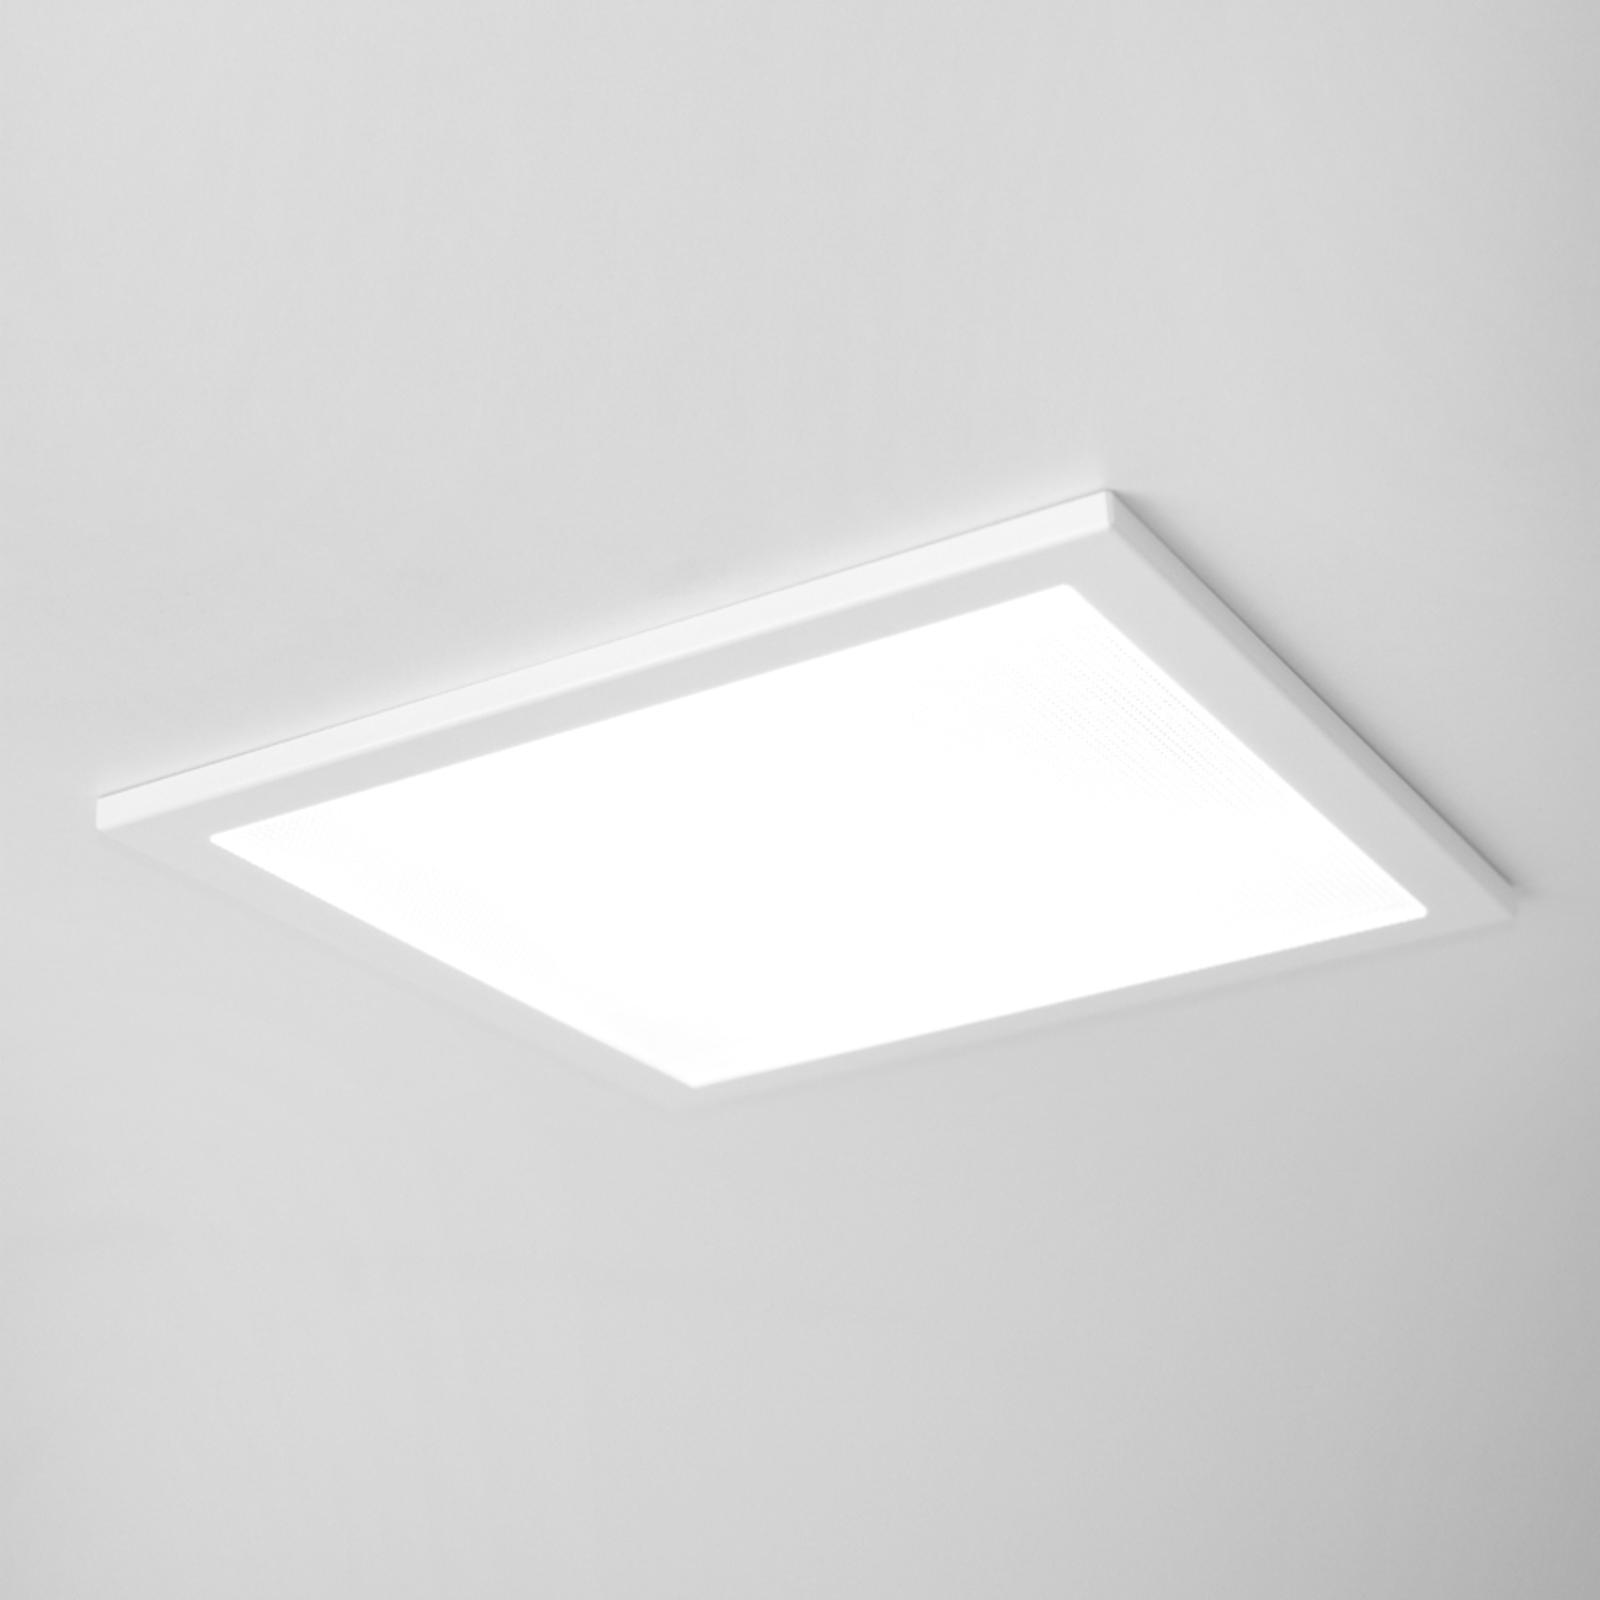 SUN 9 ultraflad LED-loftindbygningslampe hvid 4K